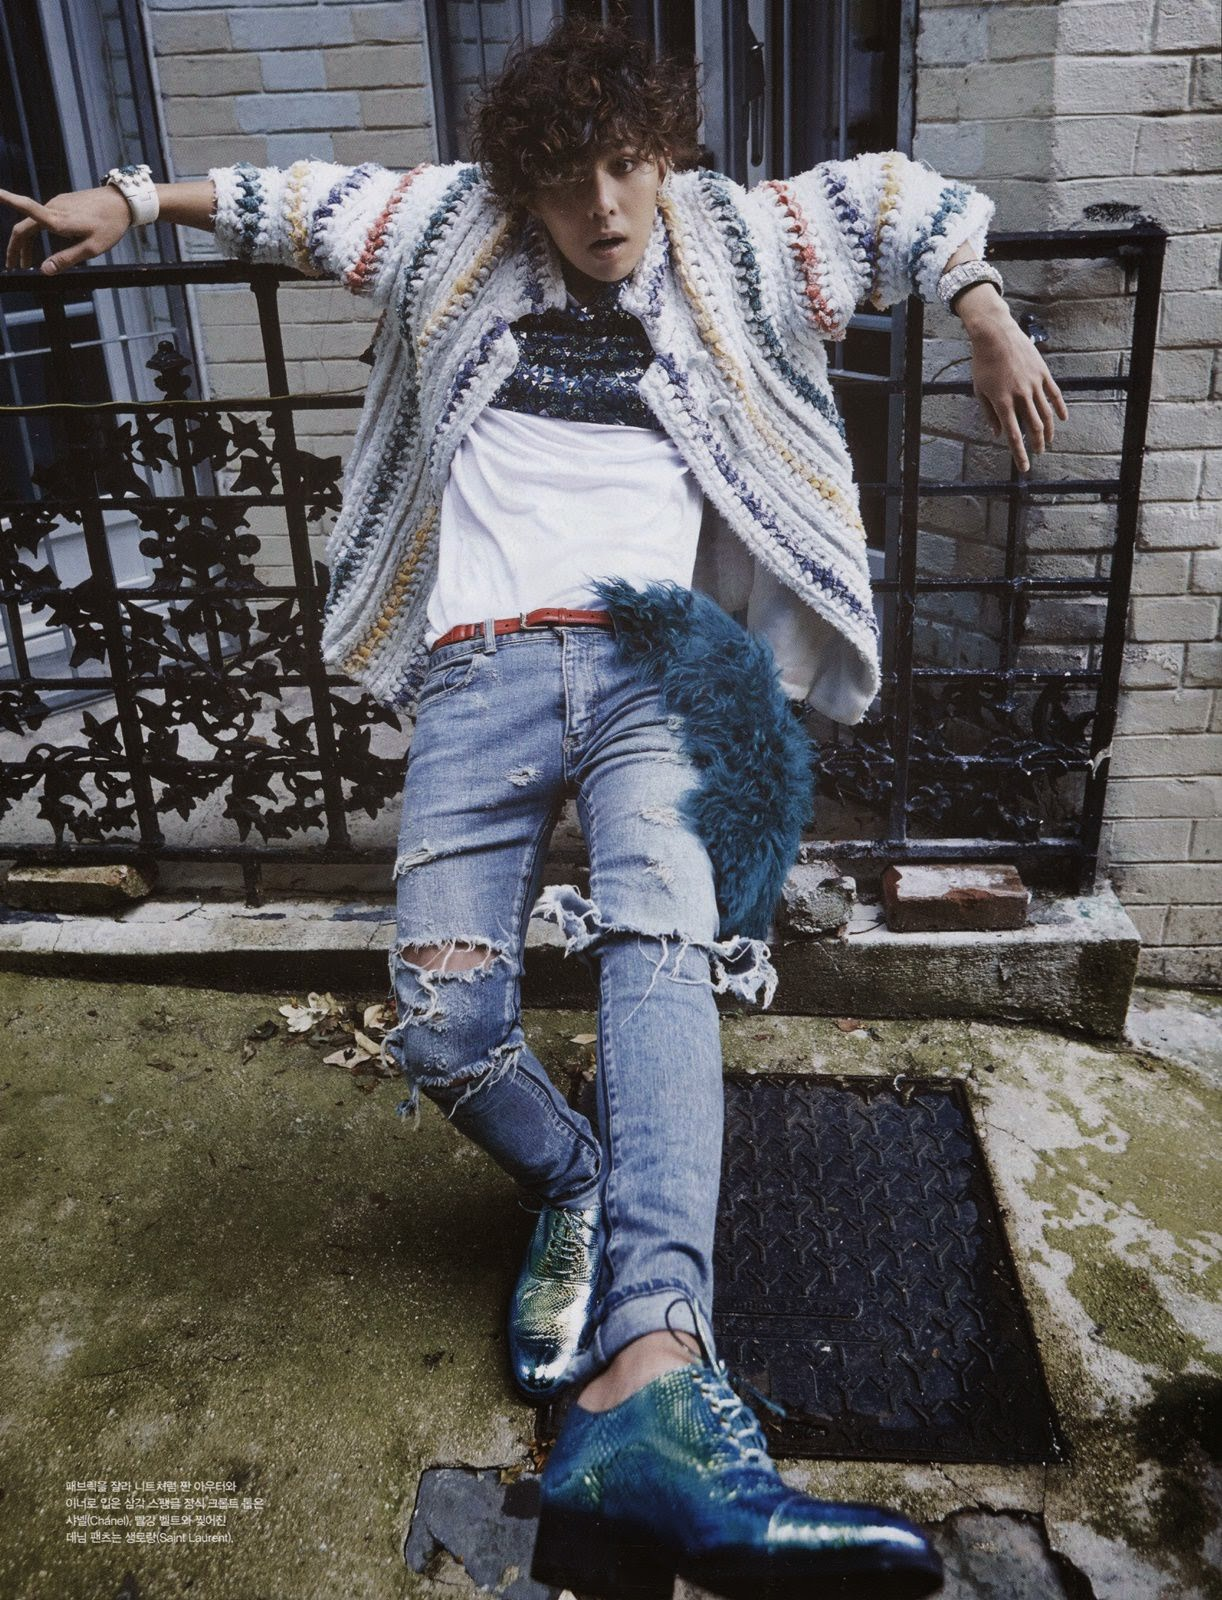 Scans: G-Dragon for Vogue Korea (January 2015) [PHOTOS]  Scans: G-Dragon for Vogue Korea (January 2015) [PHOTOS]  Scans: G-Dragon for Vogue Korea (January 2015) [PHOTOS]  Scans: G-Dragon for Vogue Korea (January 2015) [PHOTOS]